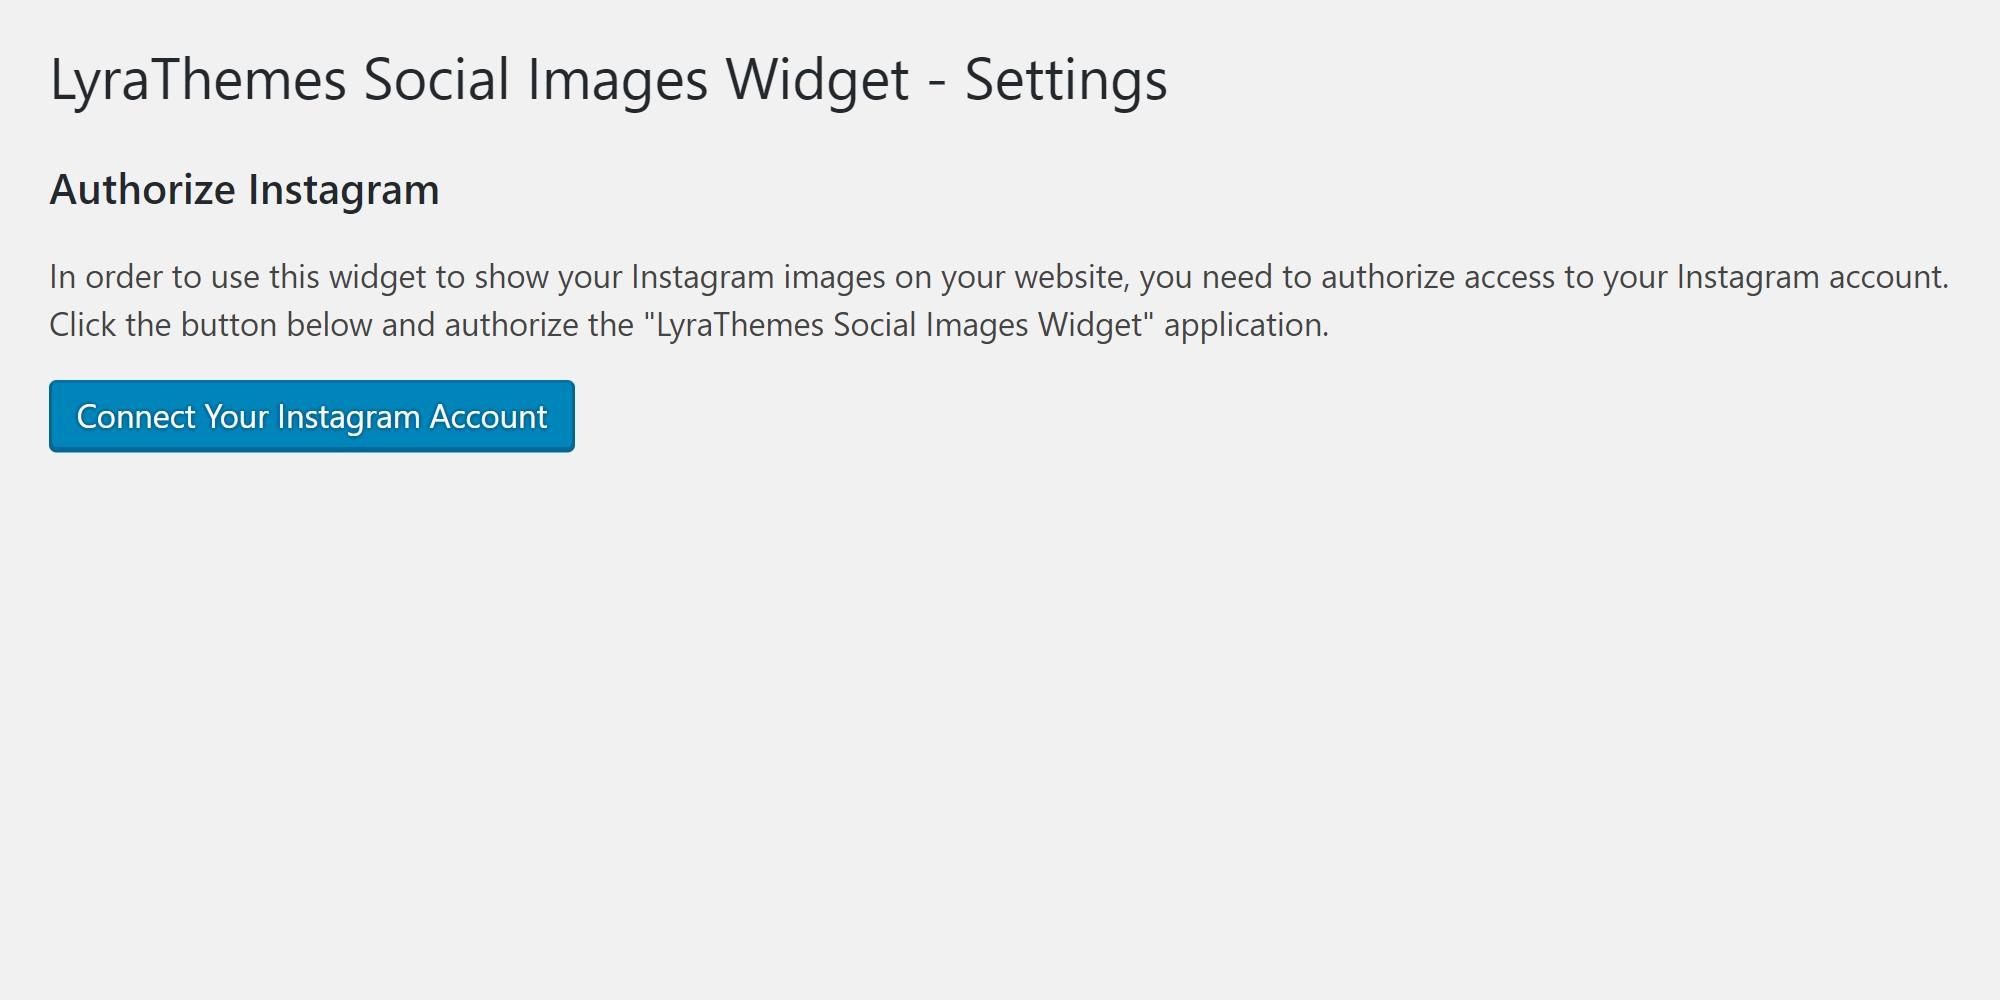 Authorize screen, Settings > Instagram Widget